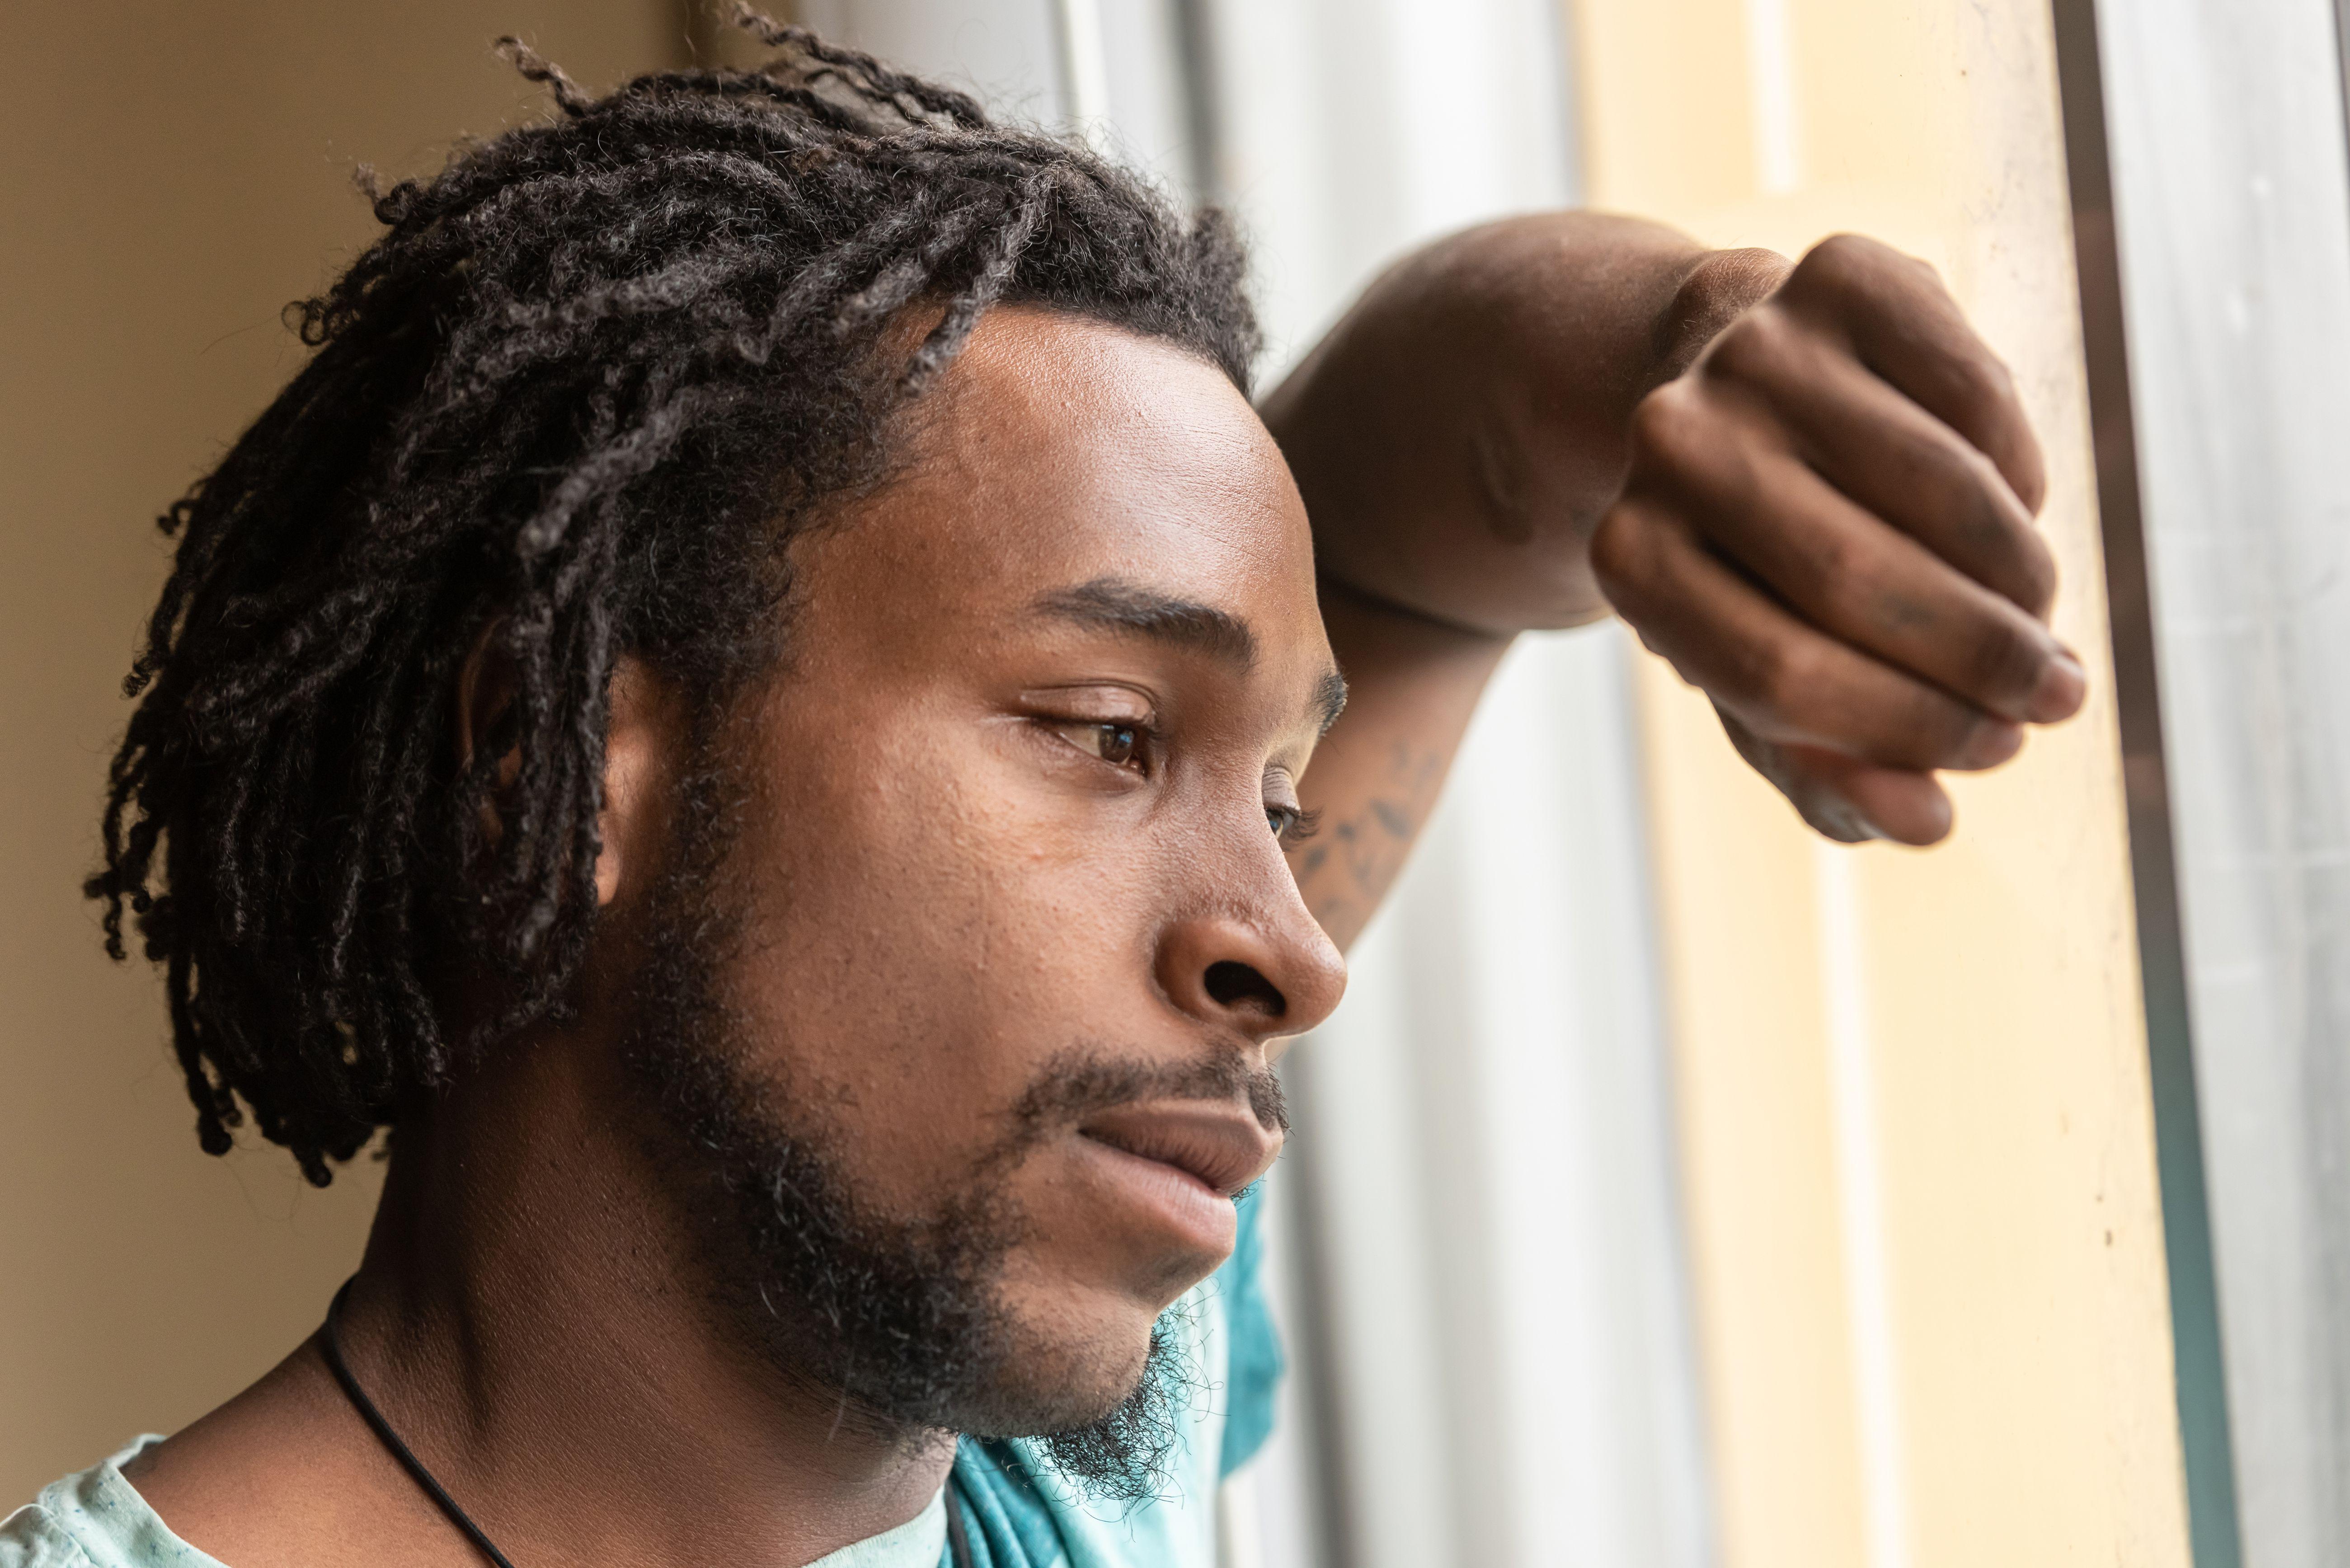 Sad Afro american man